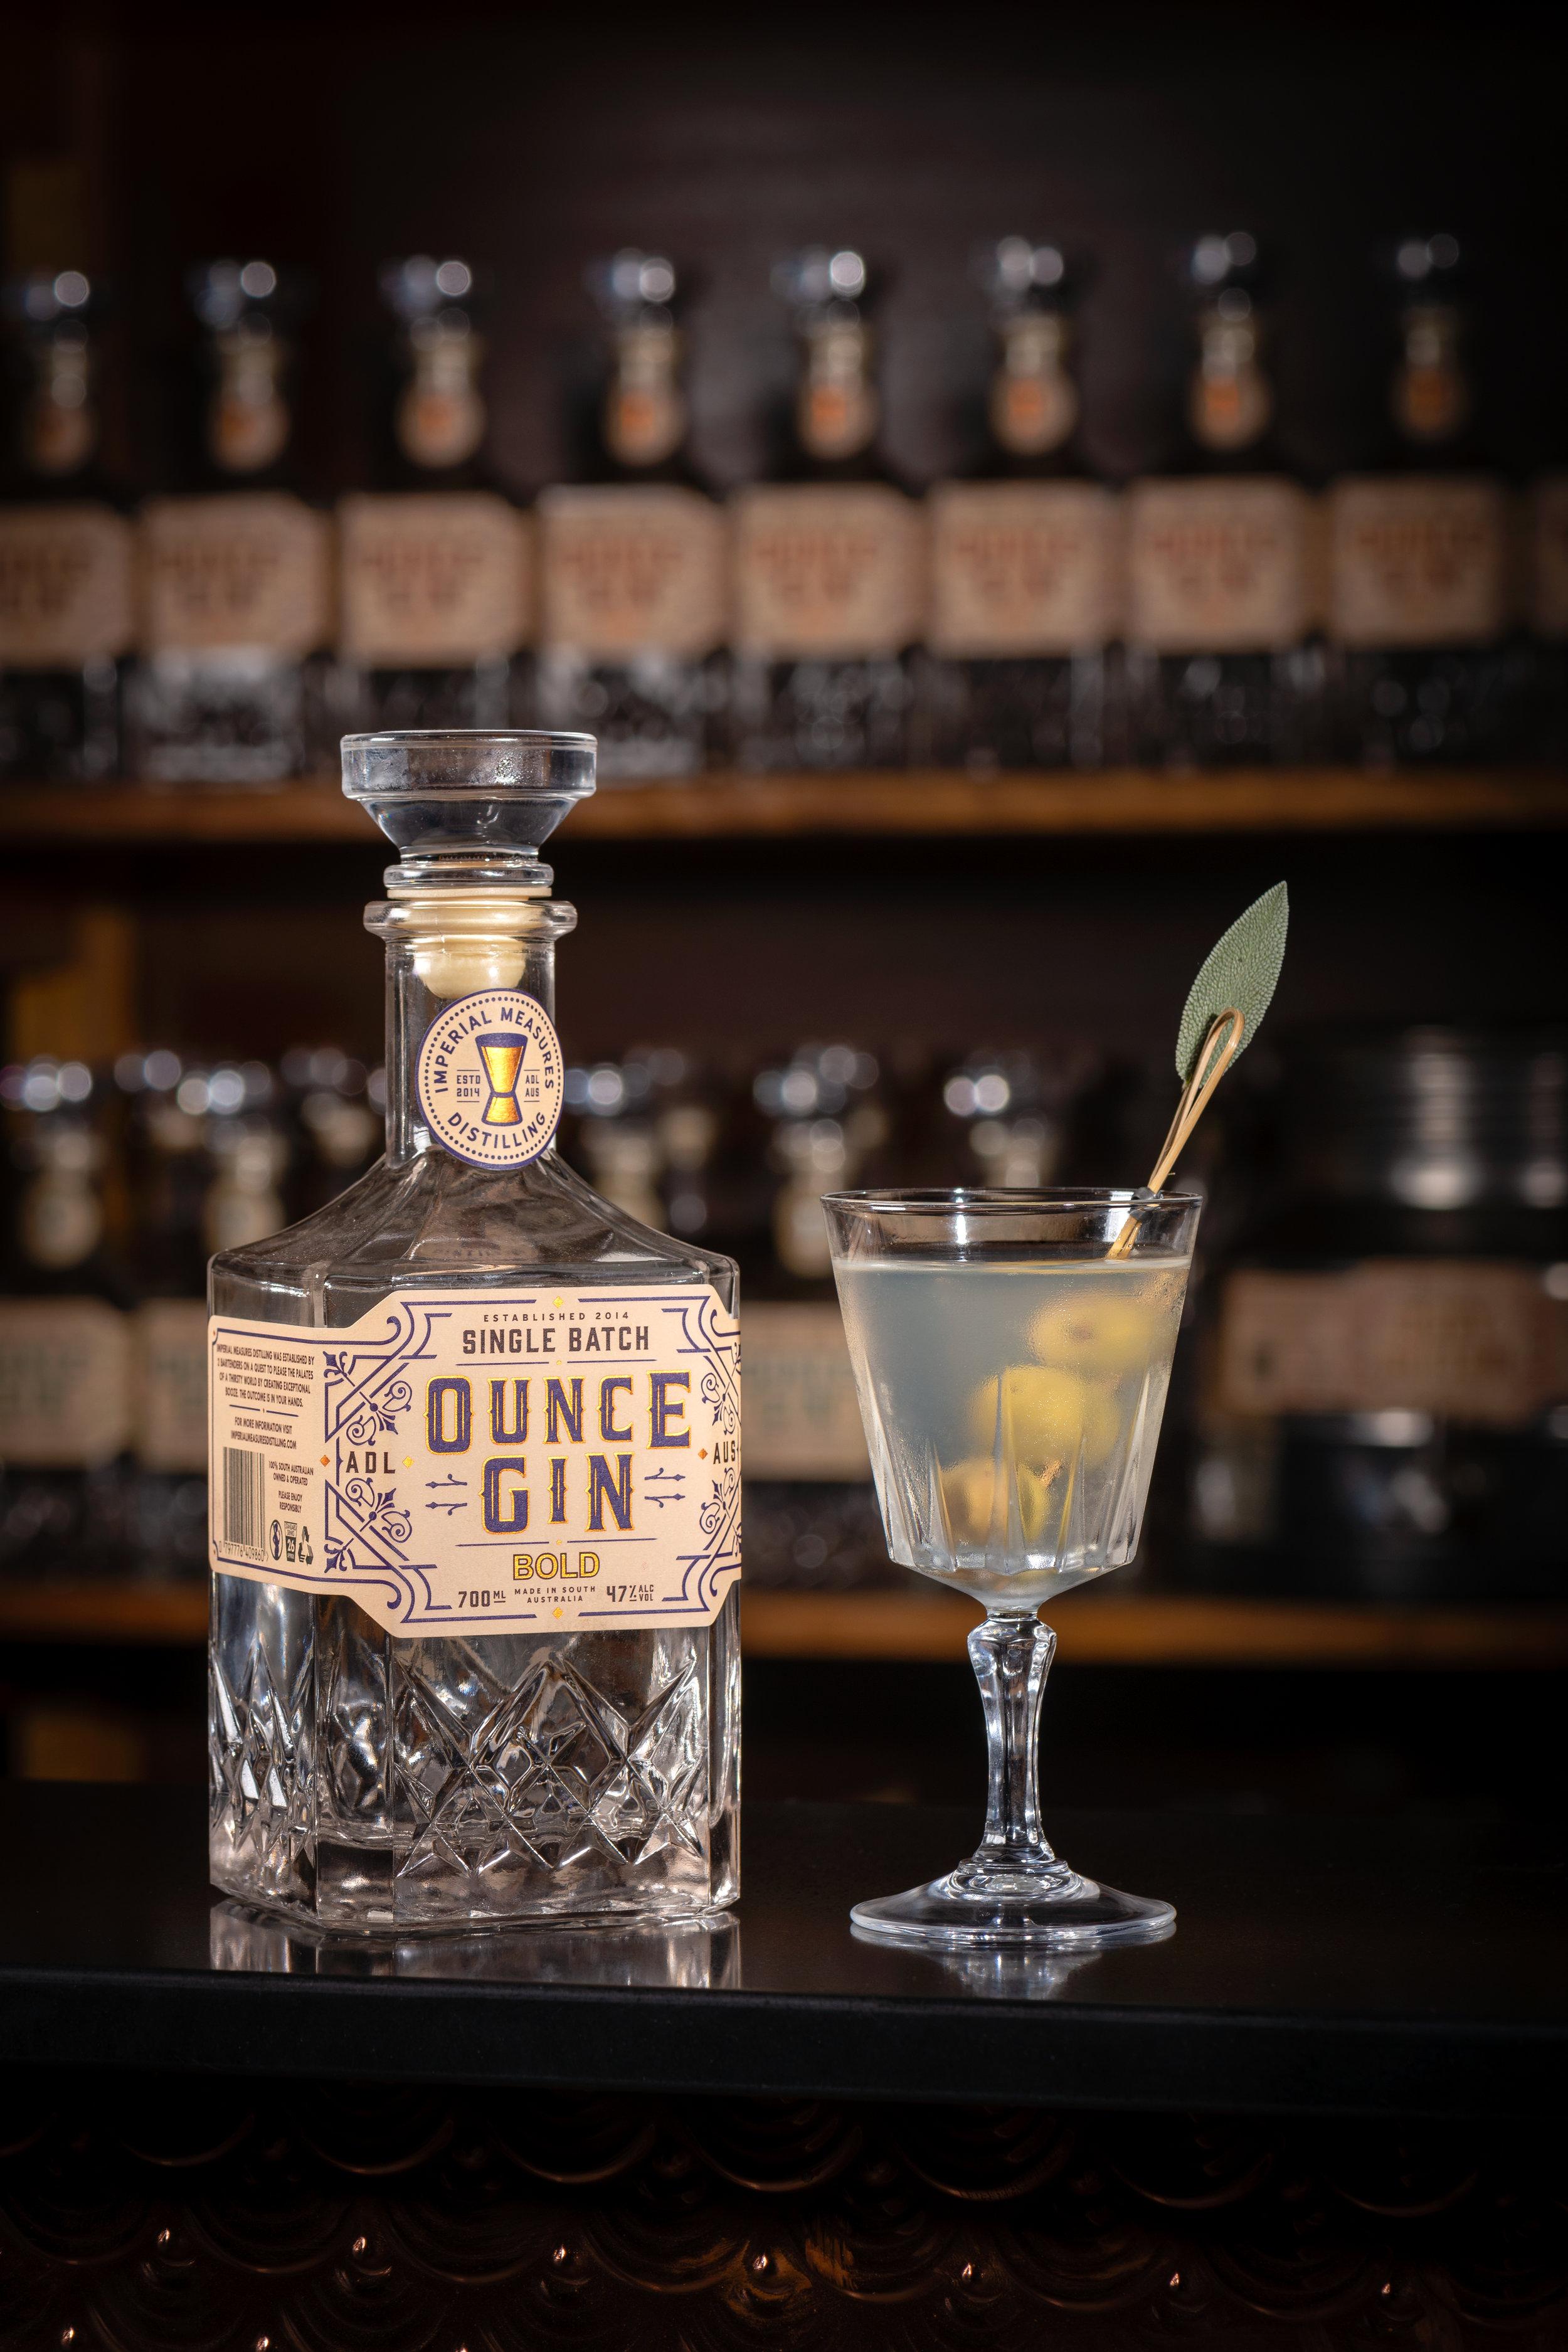 Ounce Gin 'Bold' - Martini